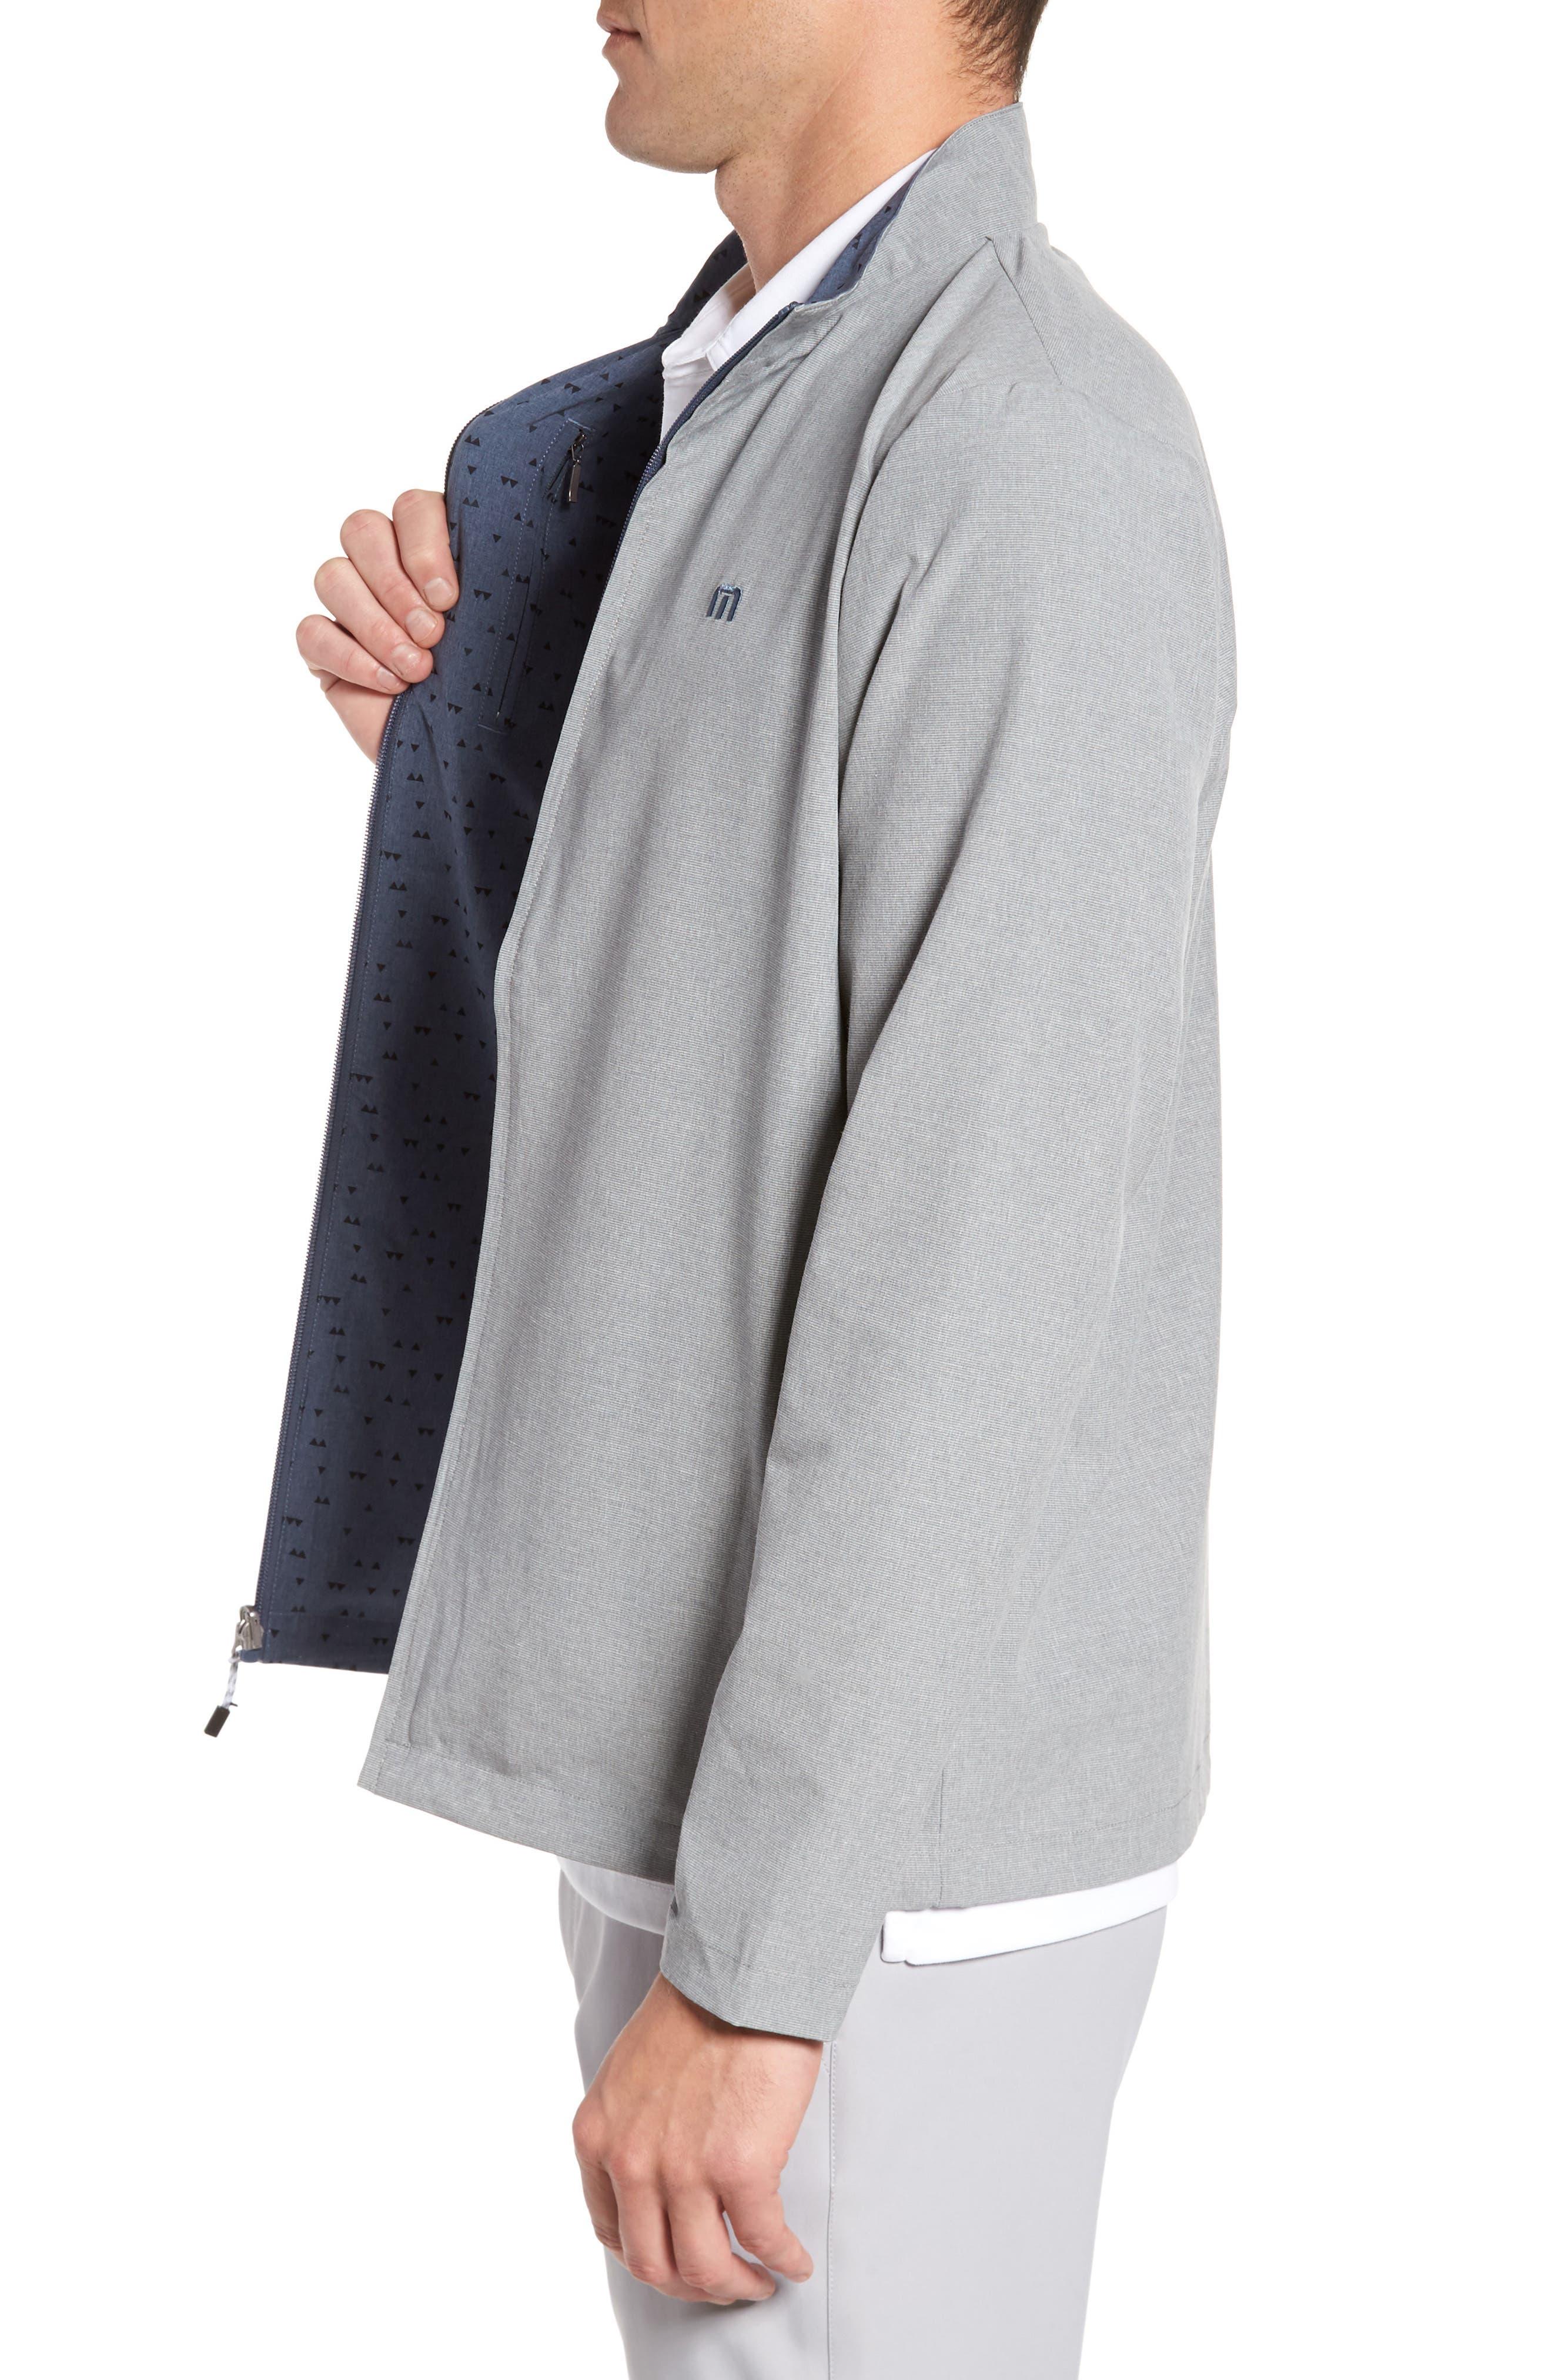 Nowo Reversible Jacket,                             Alternate thumbnail 3, color,                             Heather Alloy